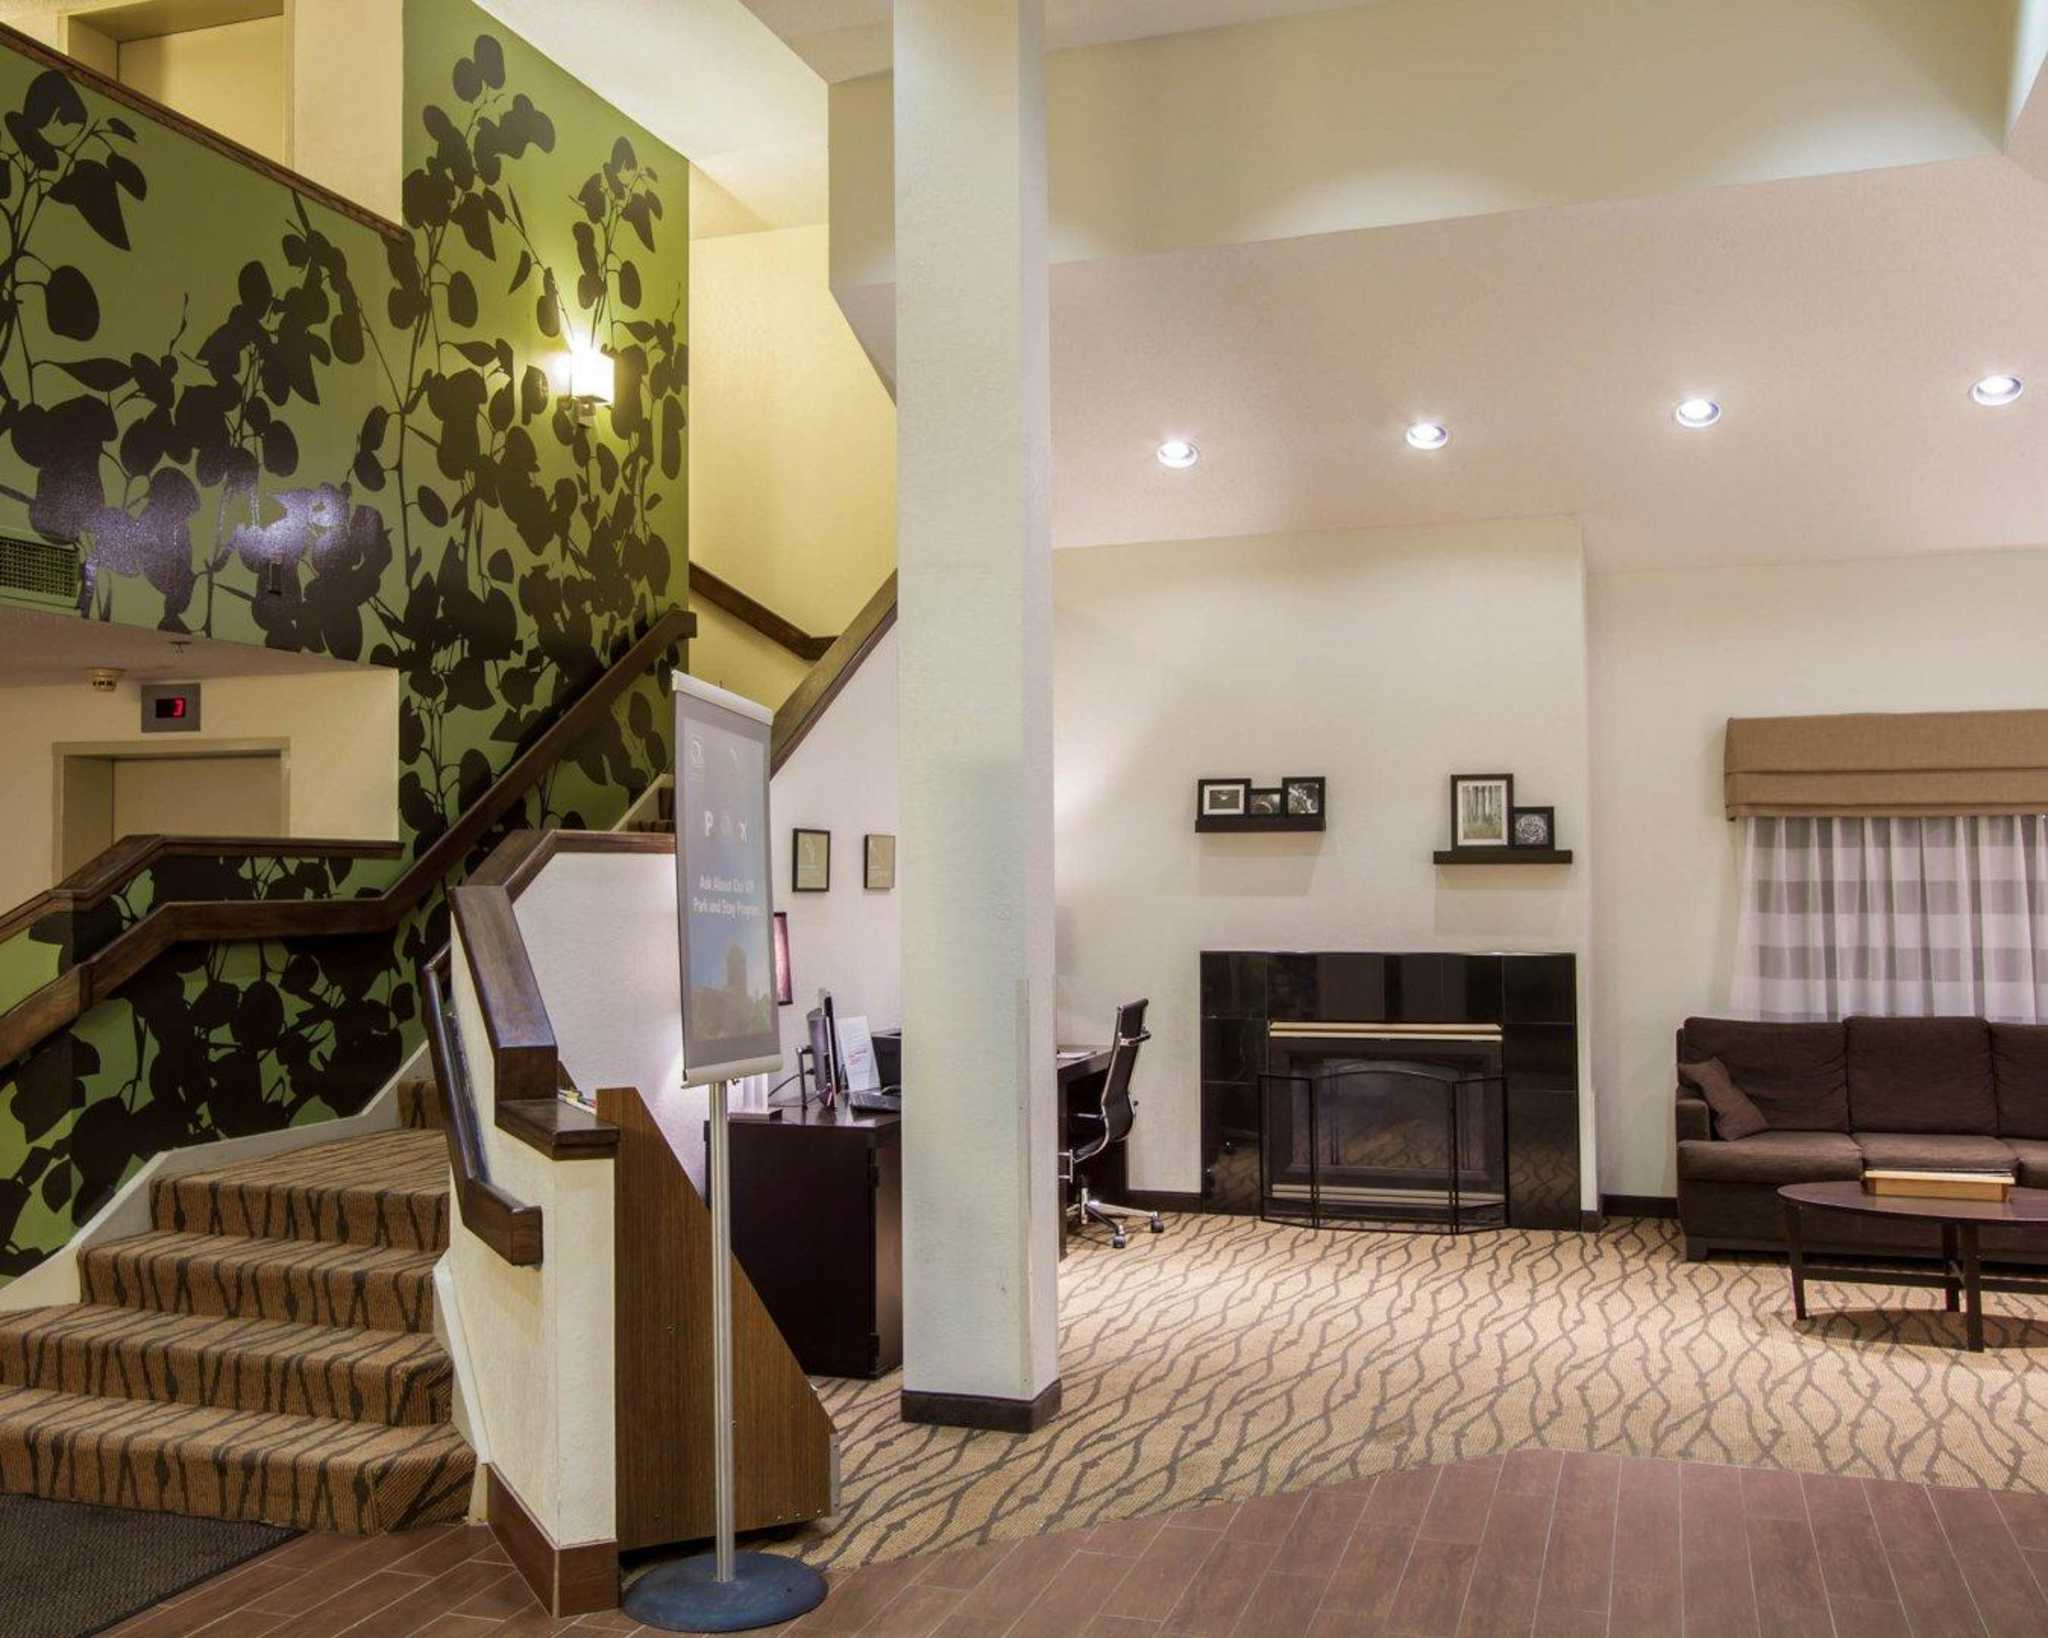 Sleep Inn & Suites Buffalo Airport image 13